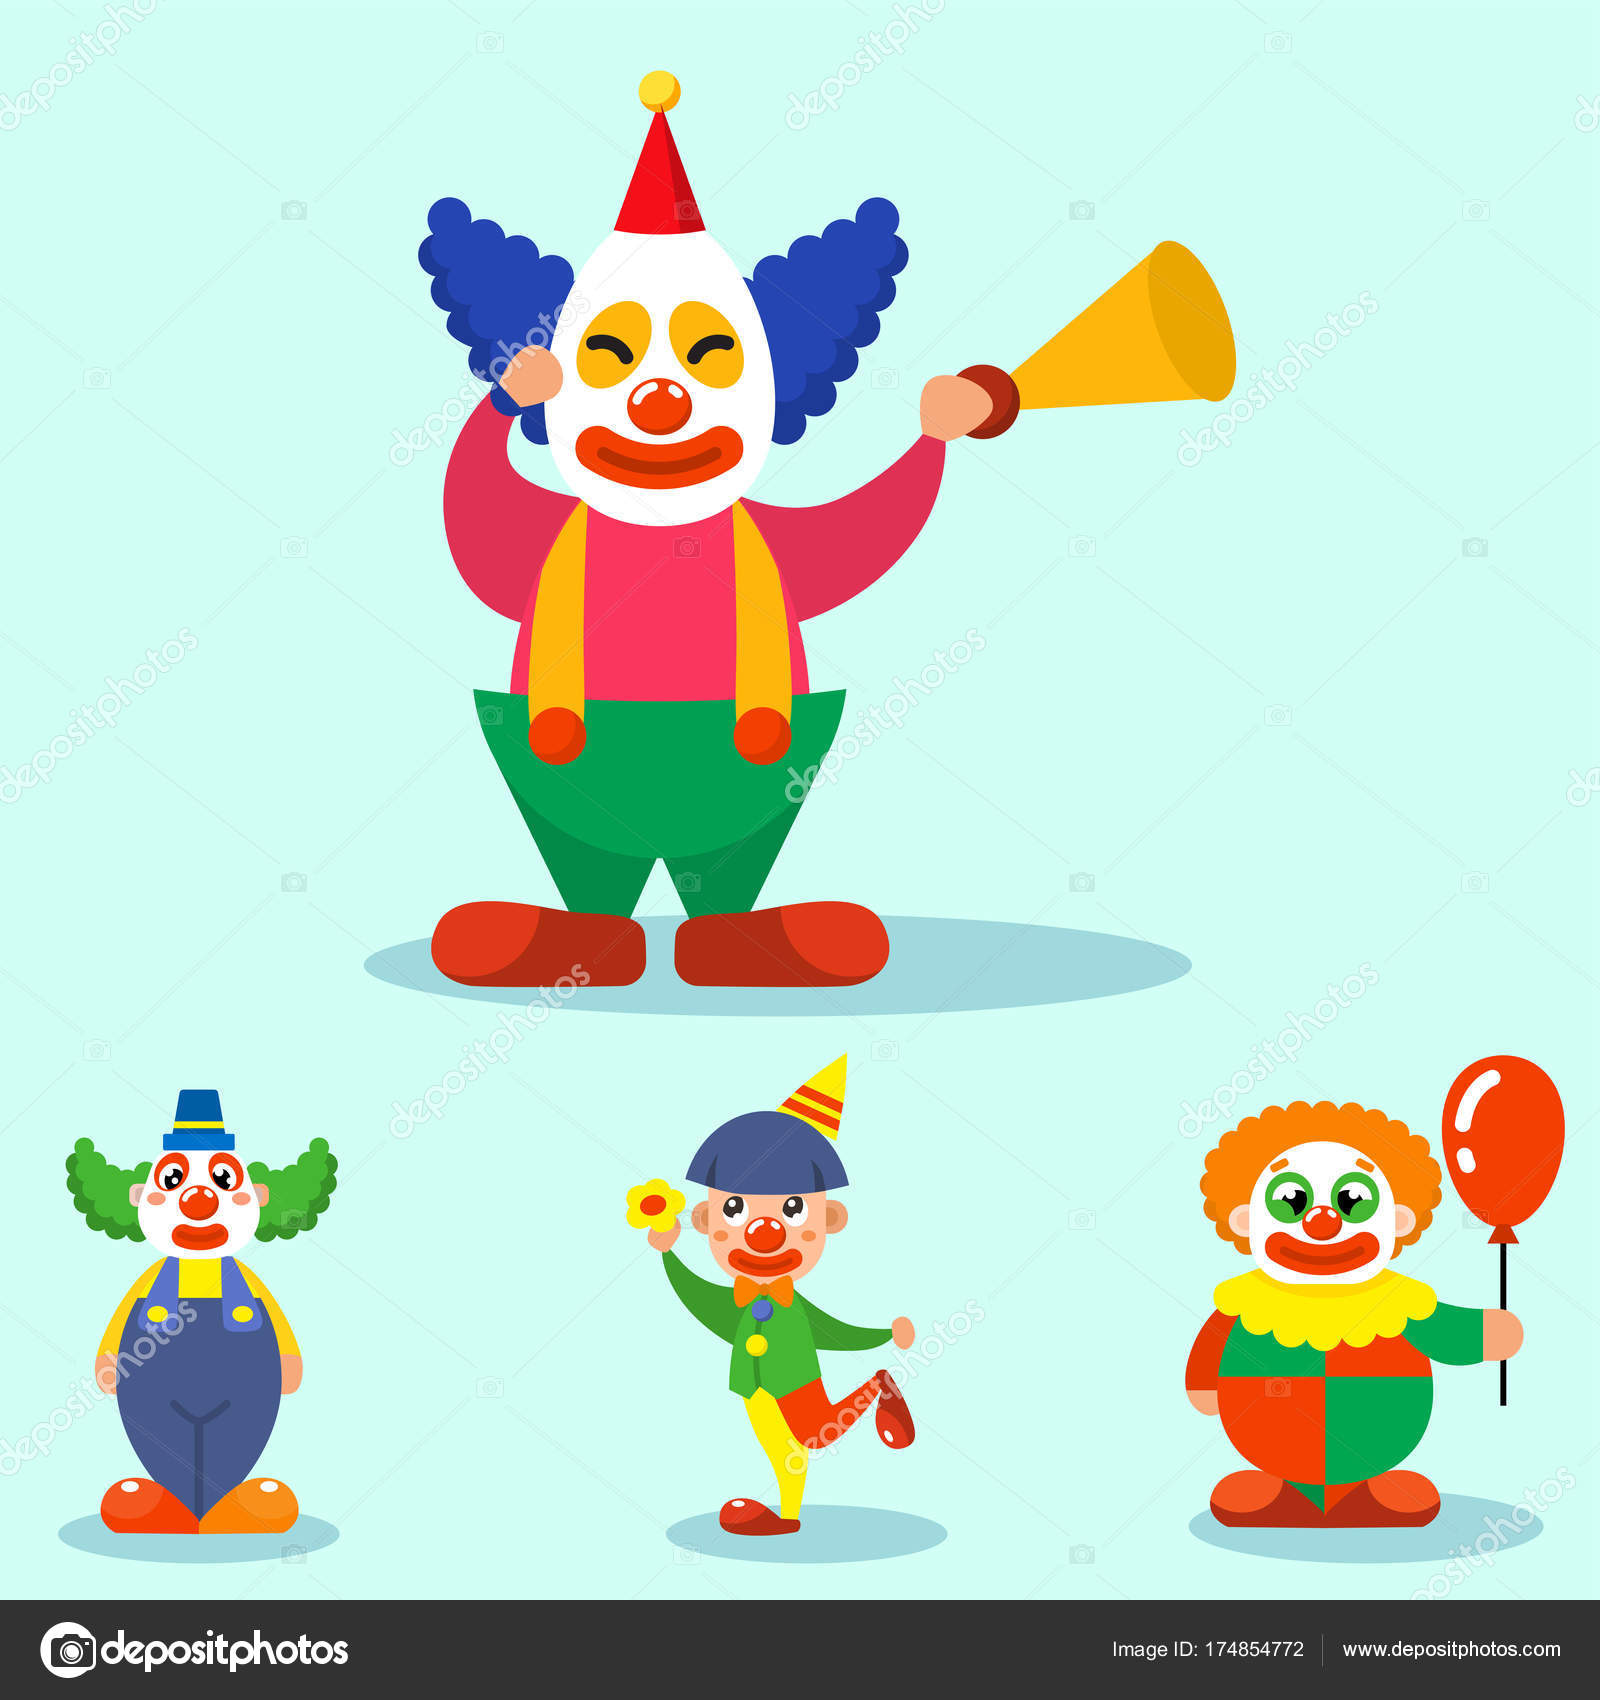 clown cute characters performer carnival actor makeup juggling human